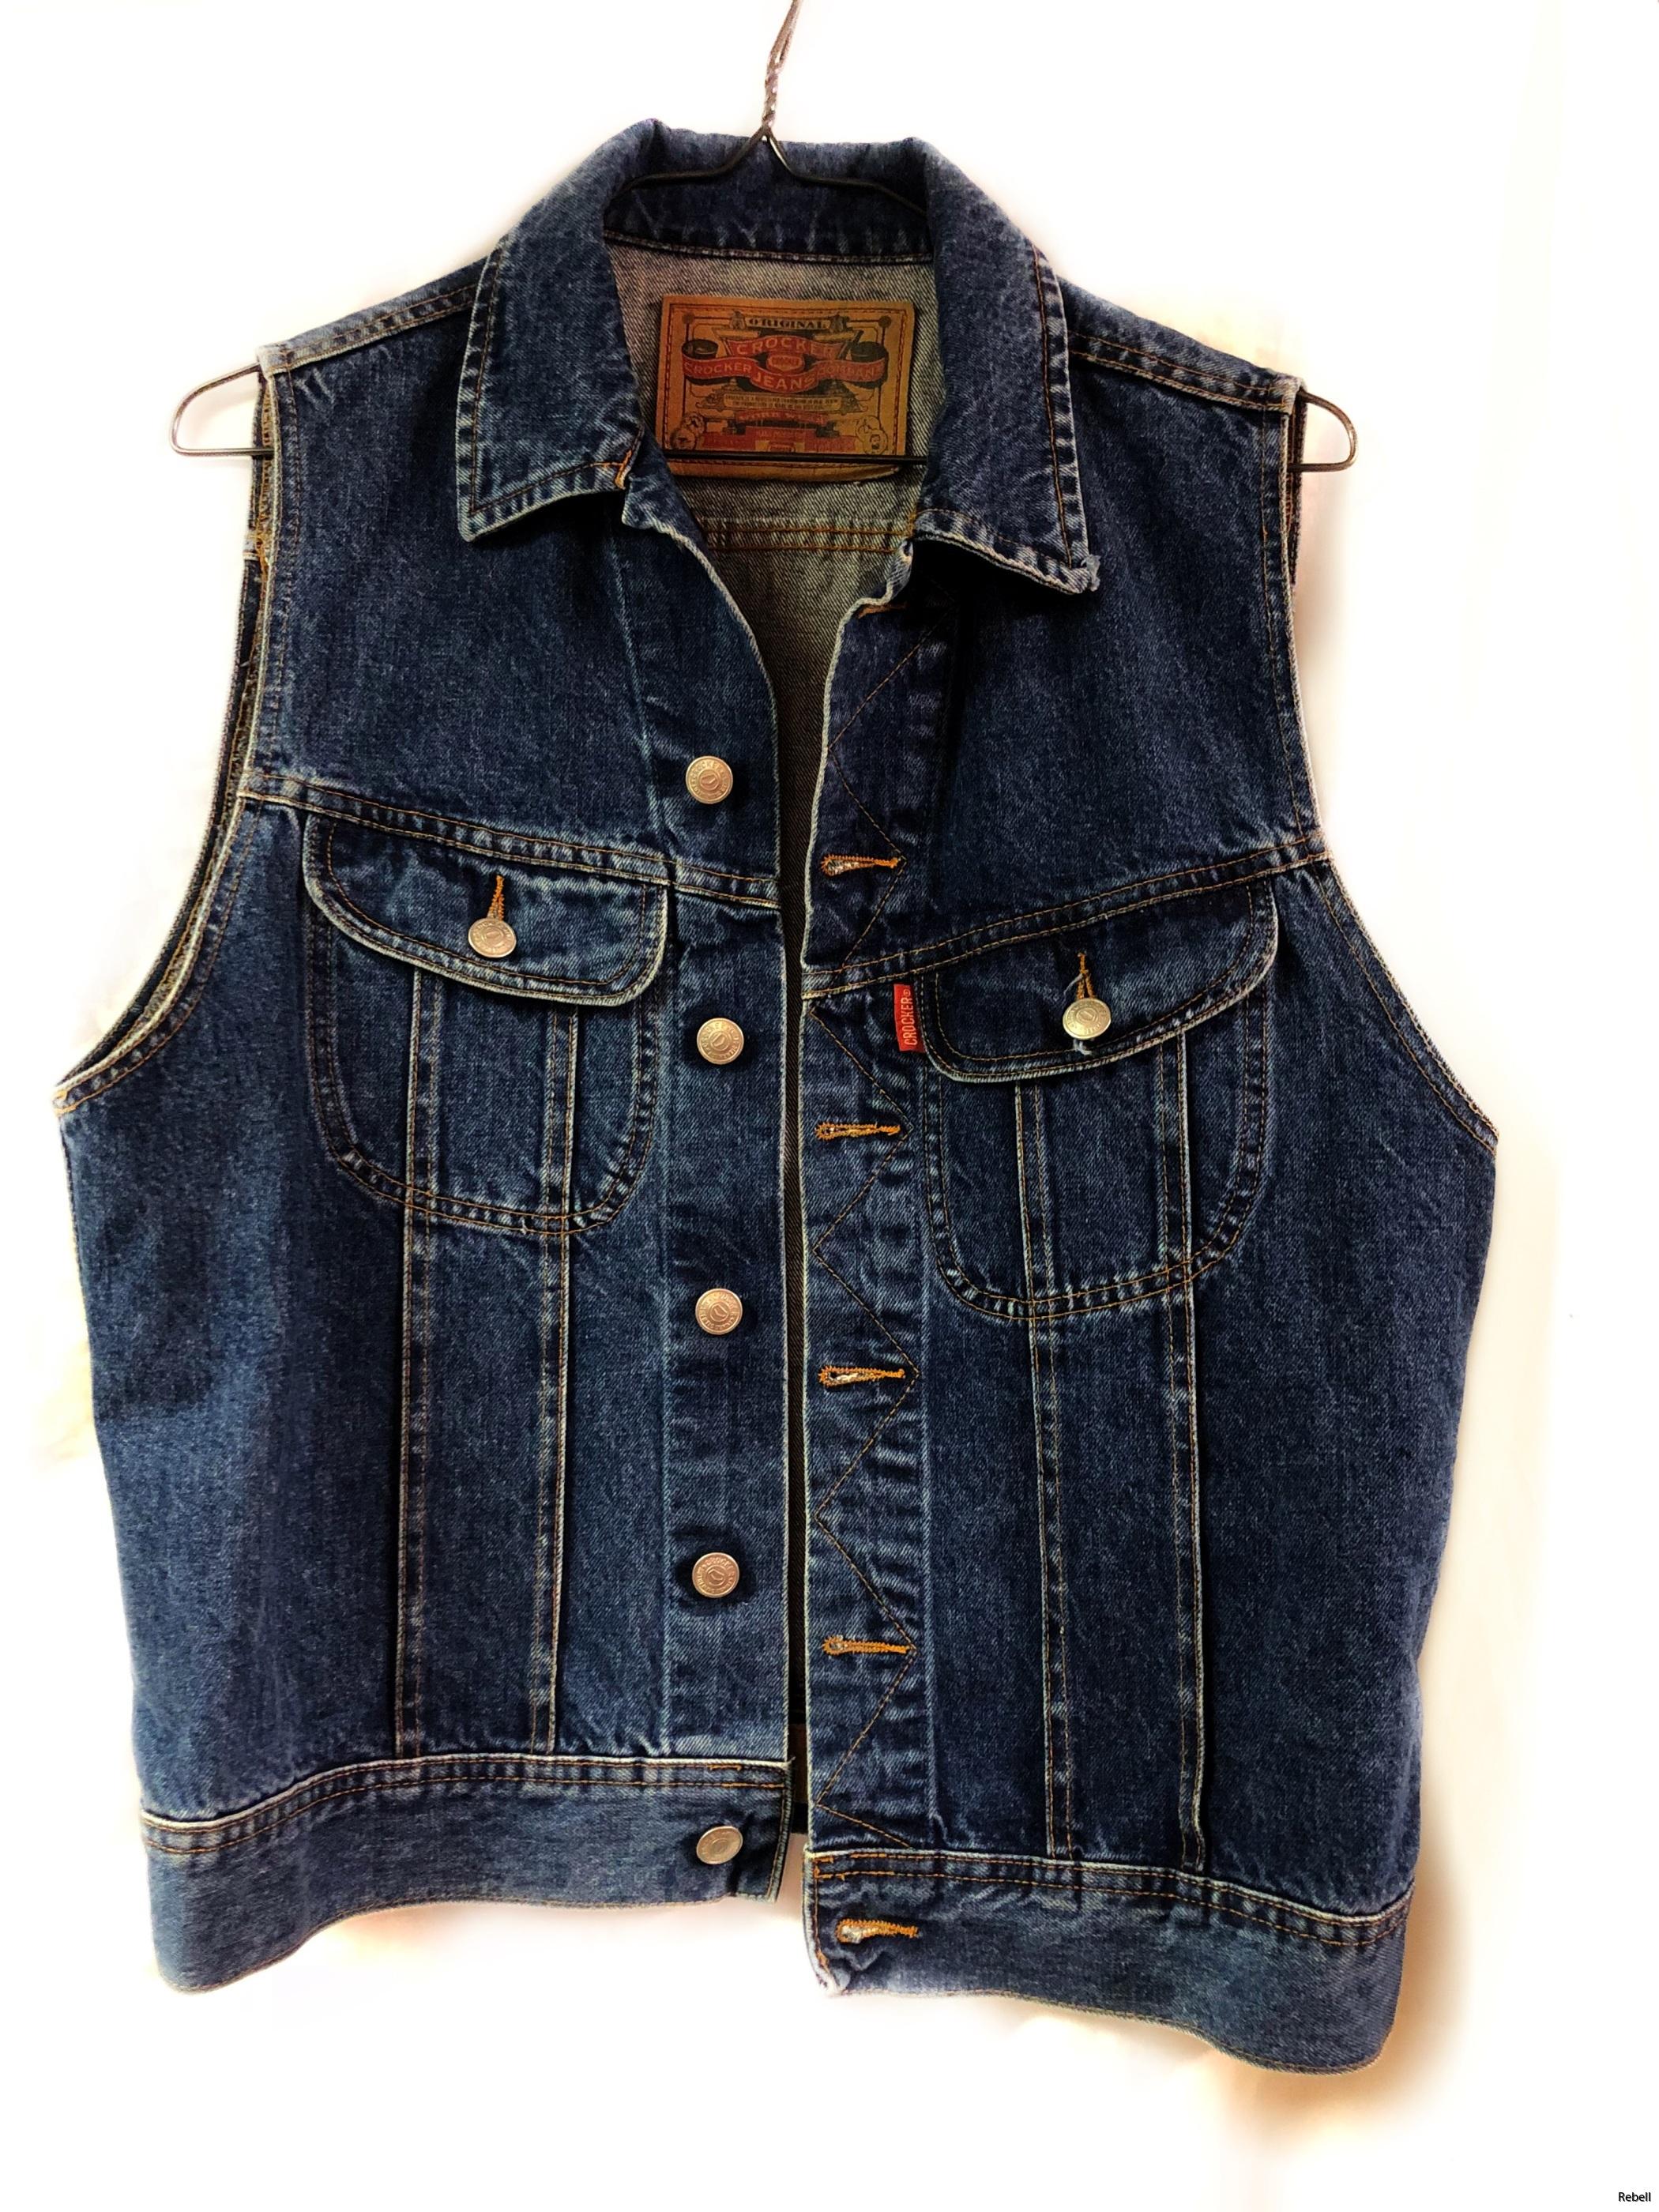 crocker jeansväst jeans väst rebell rebellclothes